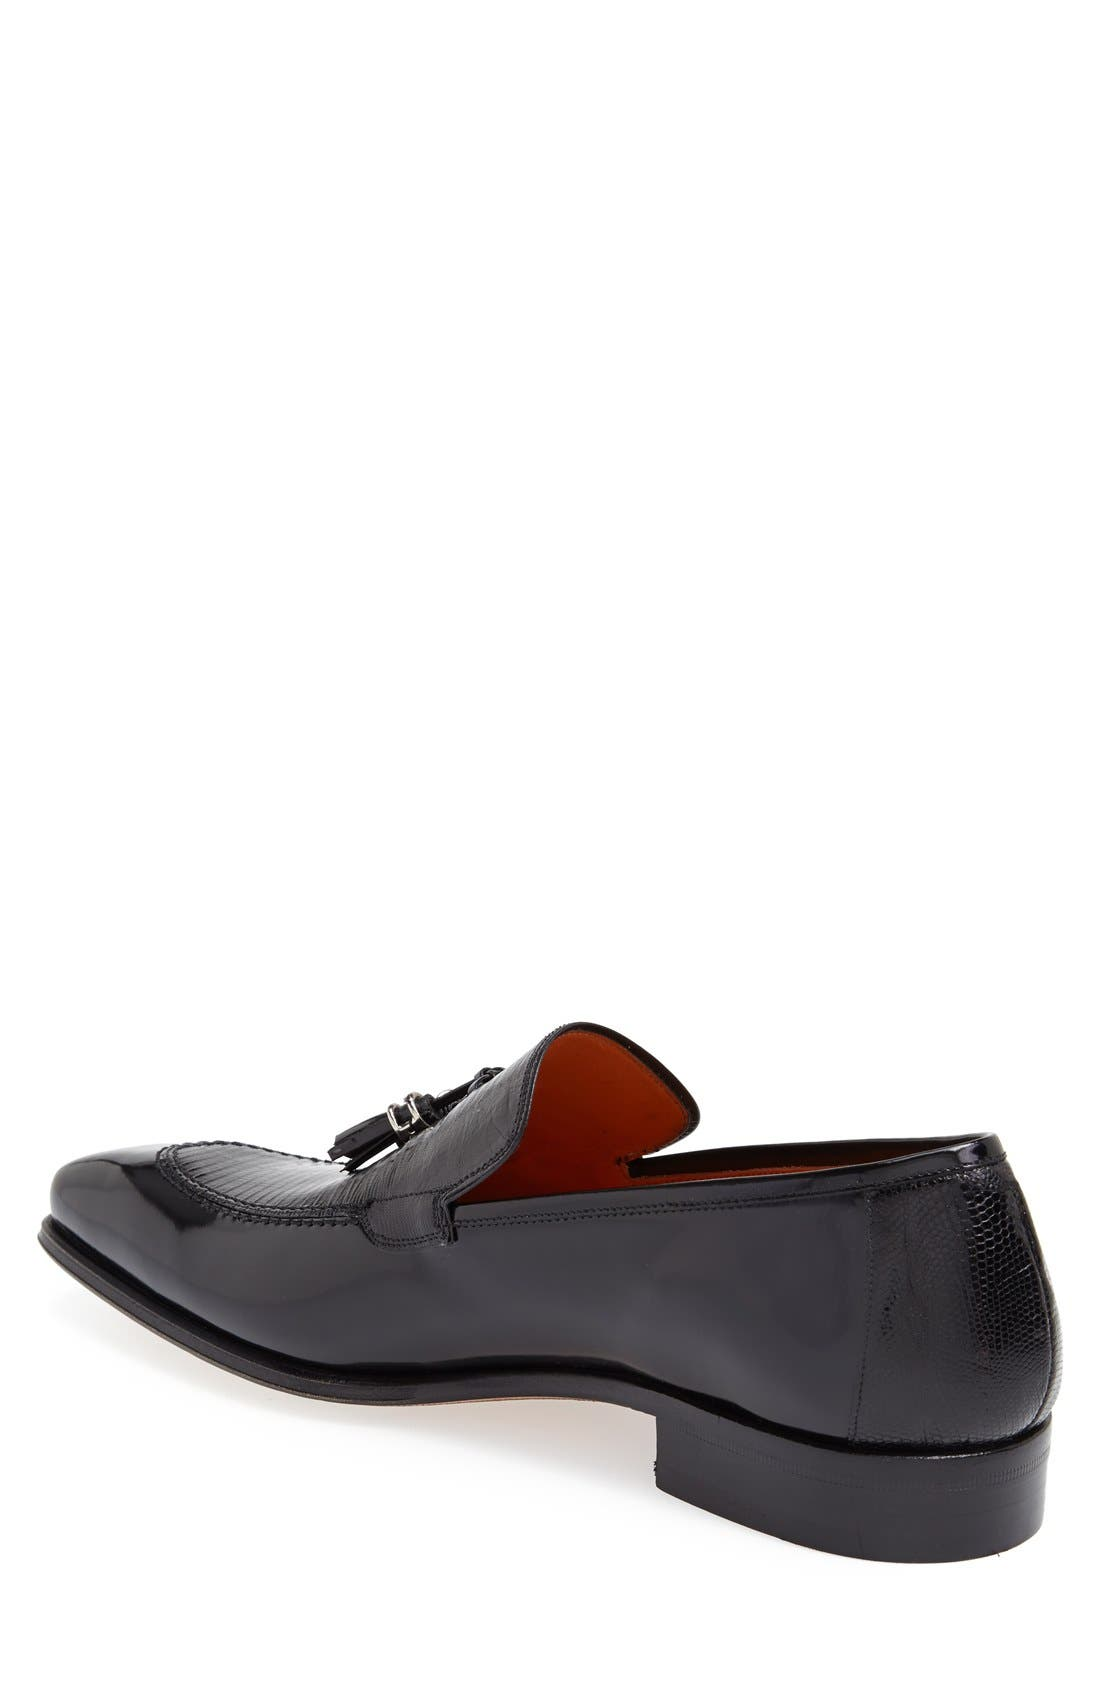 'Obrador' Lizard Leather Tassel Loafer,                             Alternate thumbnail 2, color,                             Black